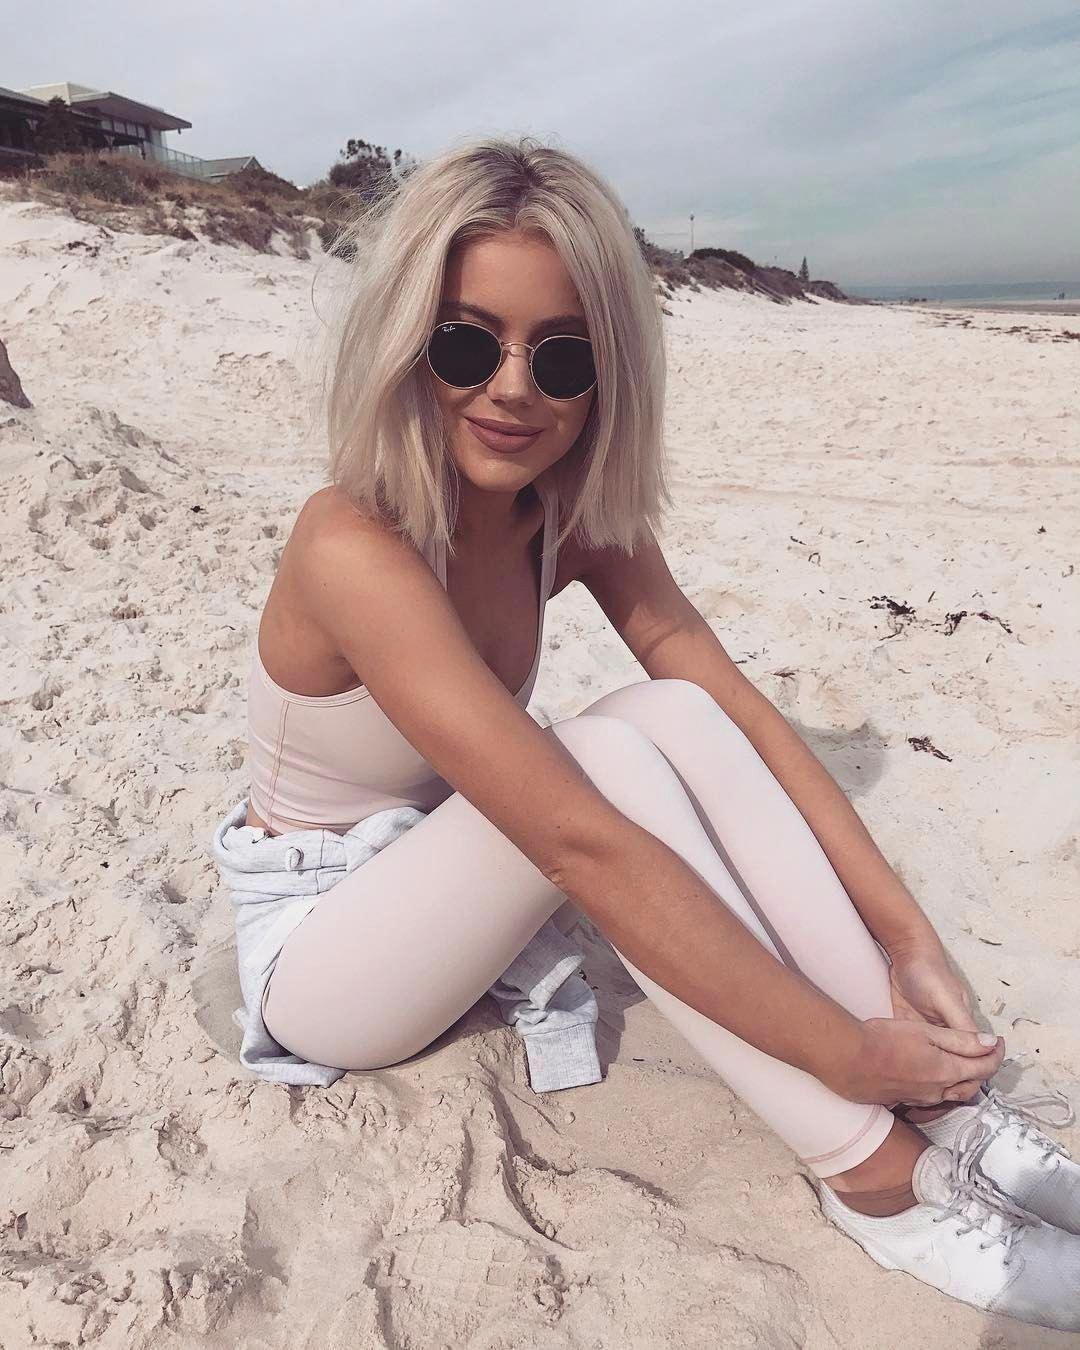 Summer Beach Styles Summer Beach Dresses For Girls Latest Beach Wear 20181108 Short Blonde Hair Hair Styles Short Hair Styles